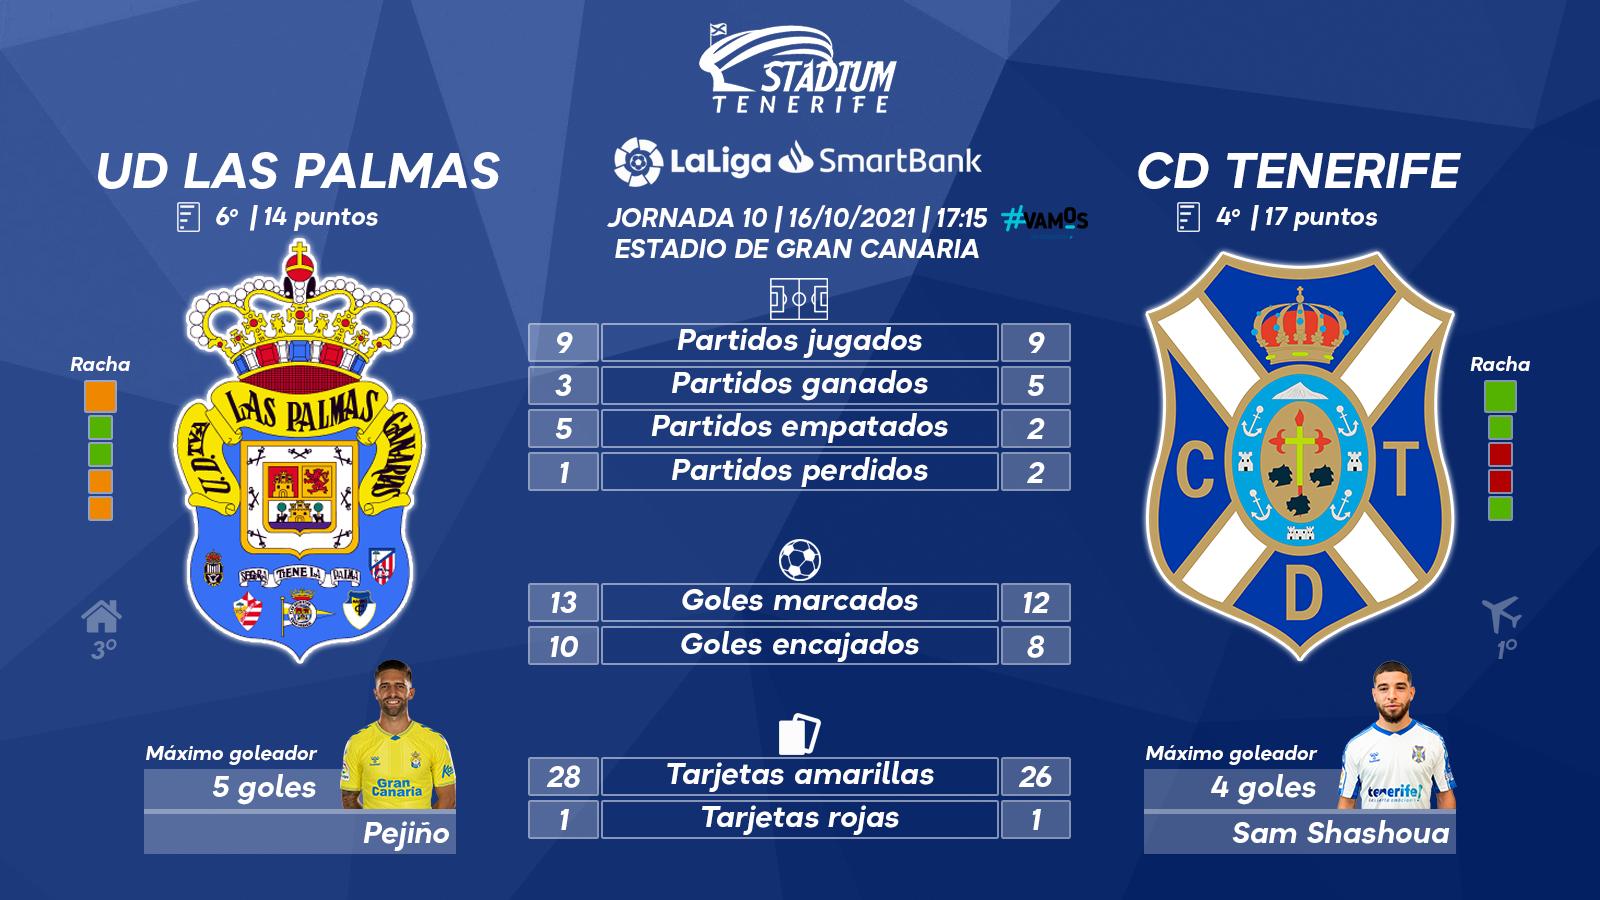 Previa del derbi UD Las Palmas-CD Tenerife (10ª J. – LaLiga SmartBank)